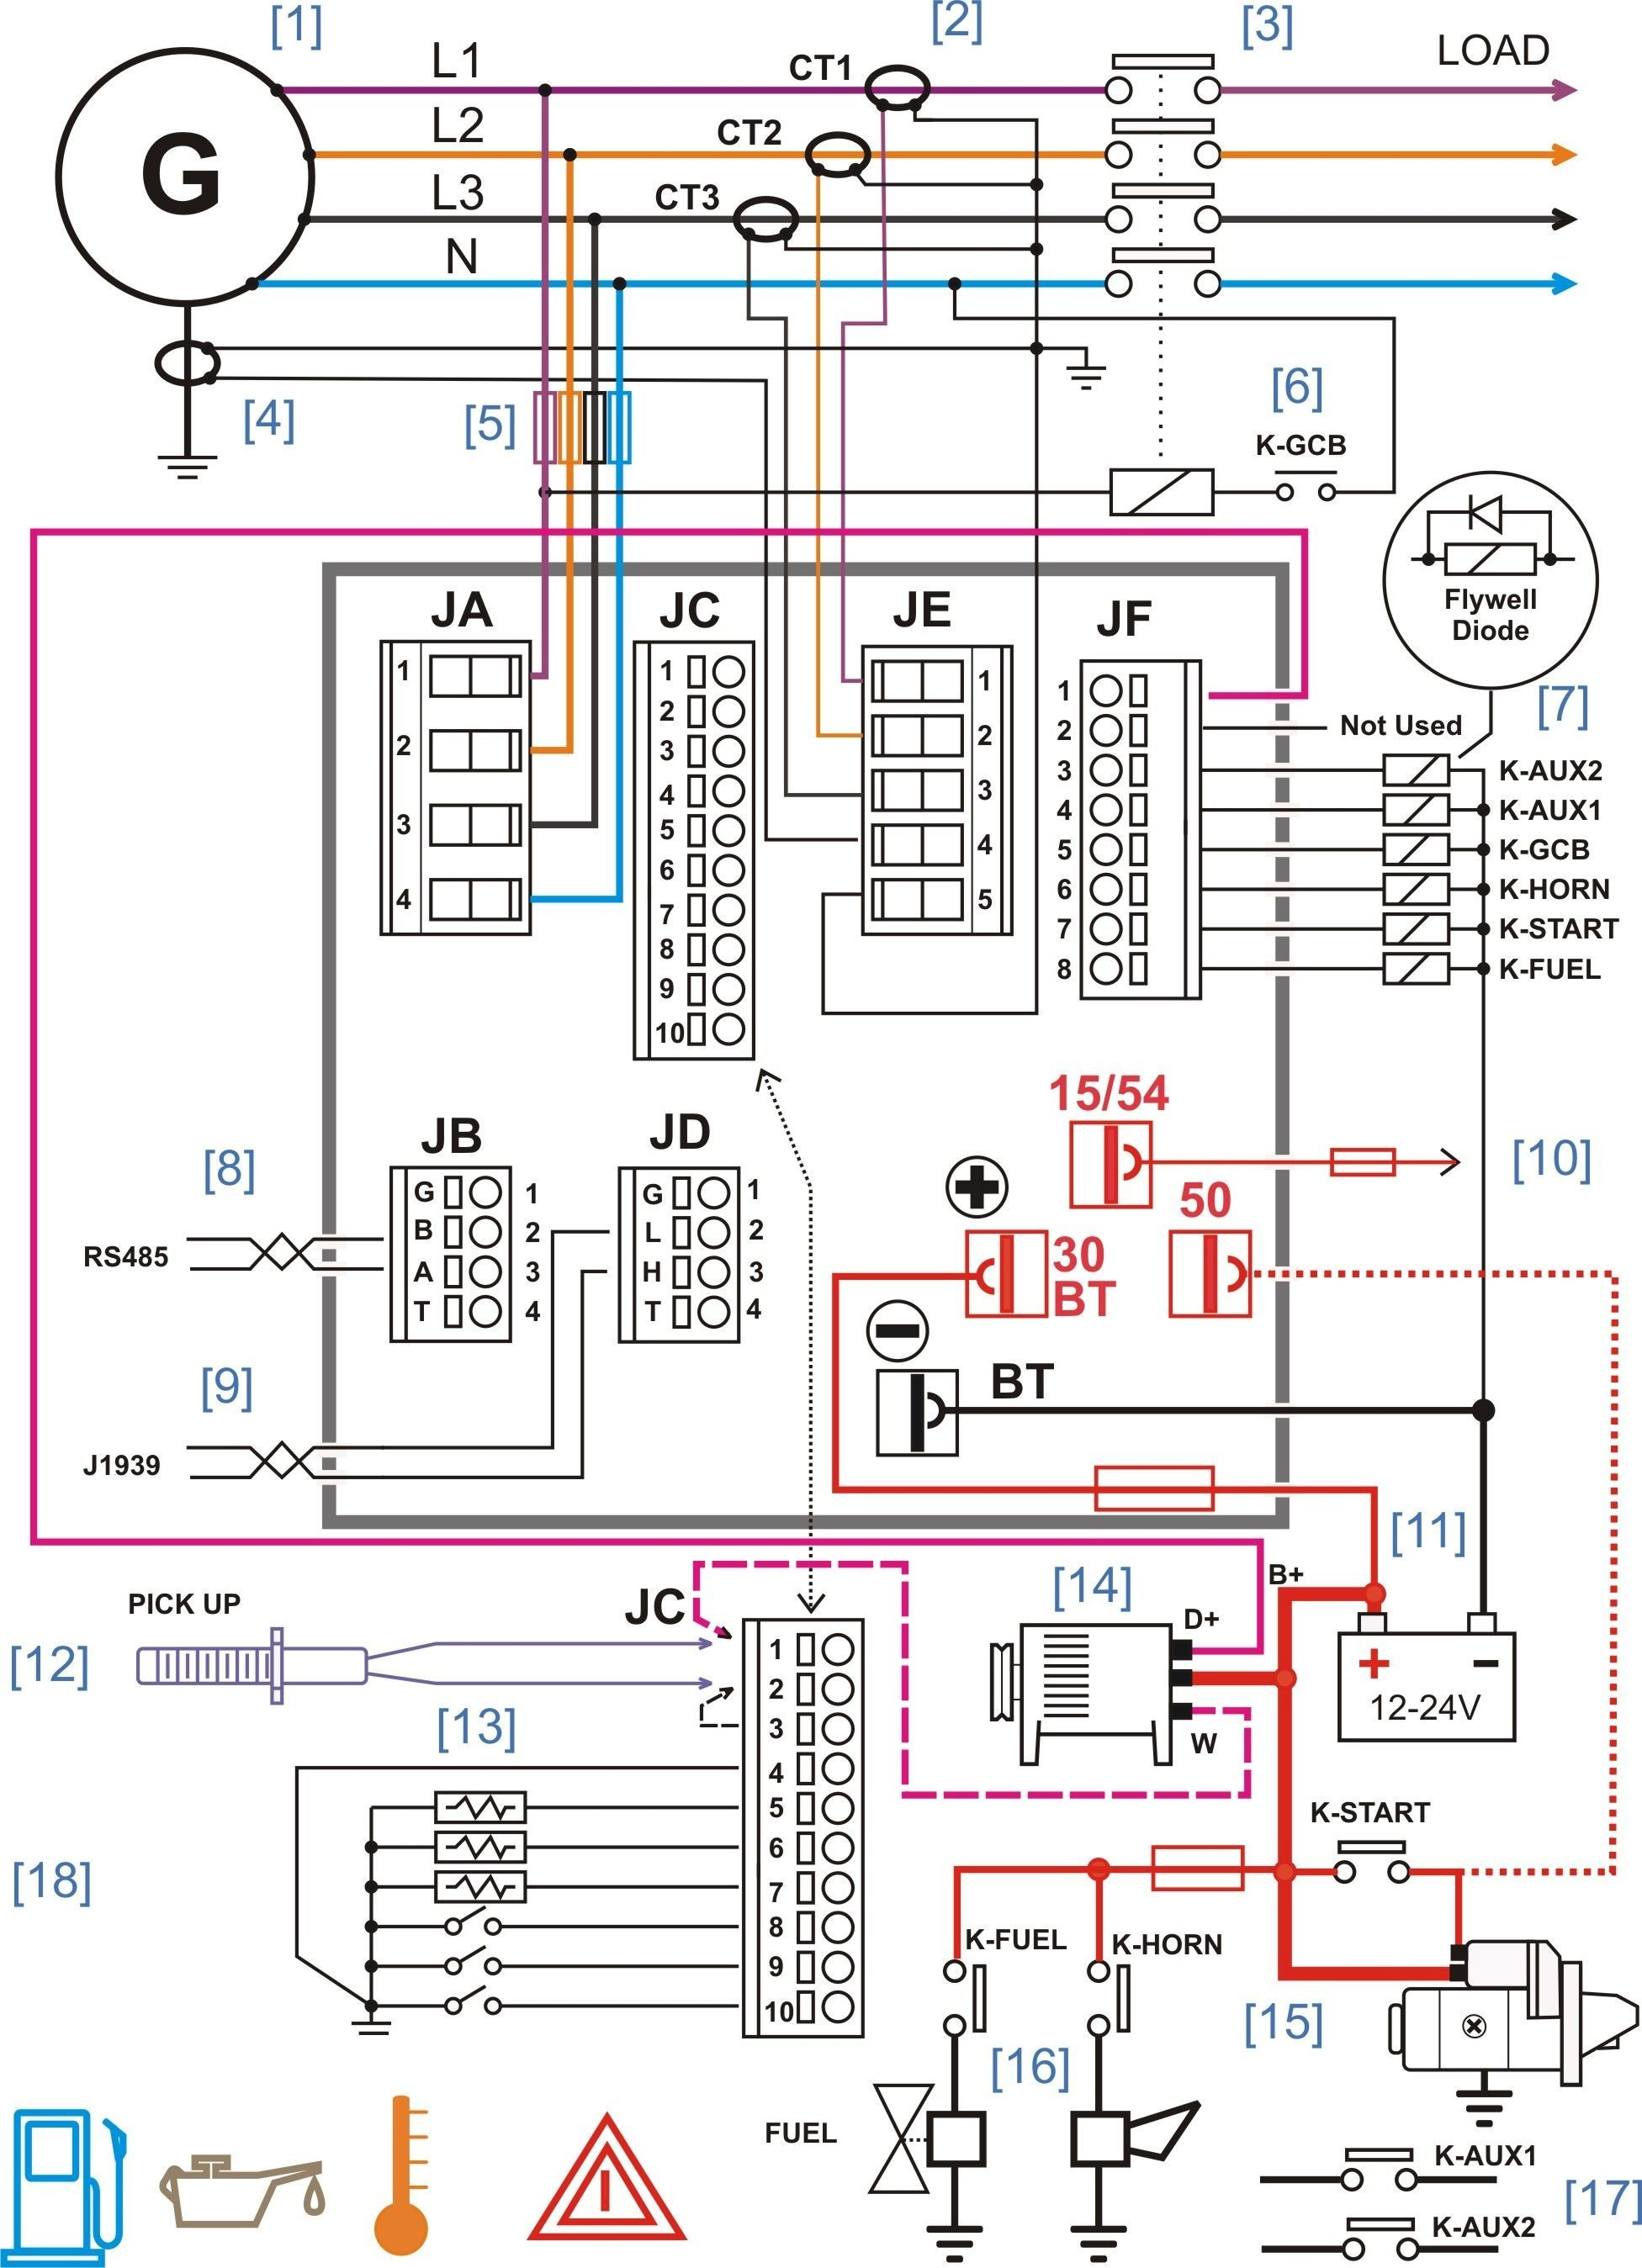 wiring diagram software open source online wiring diagram